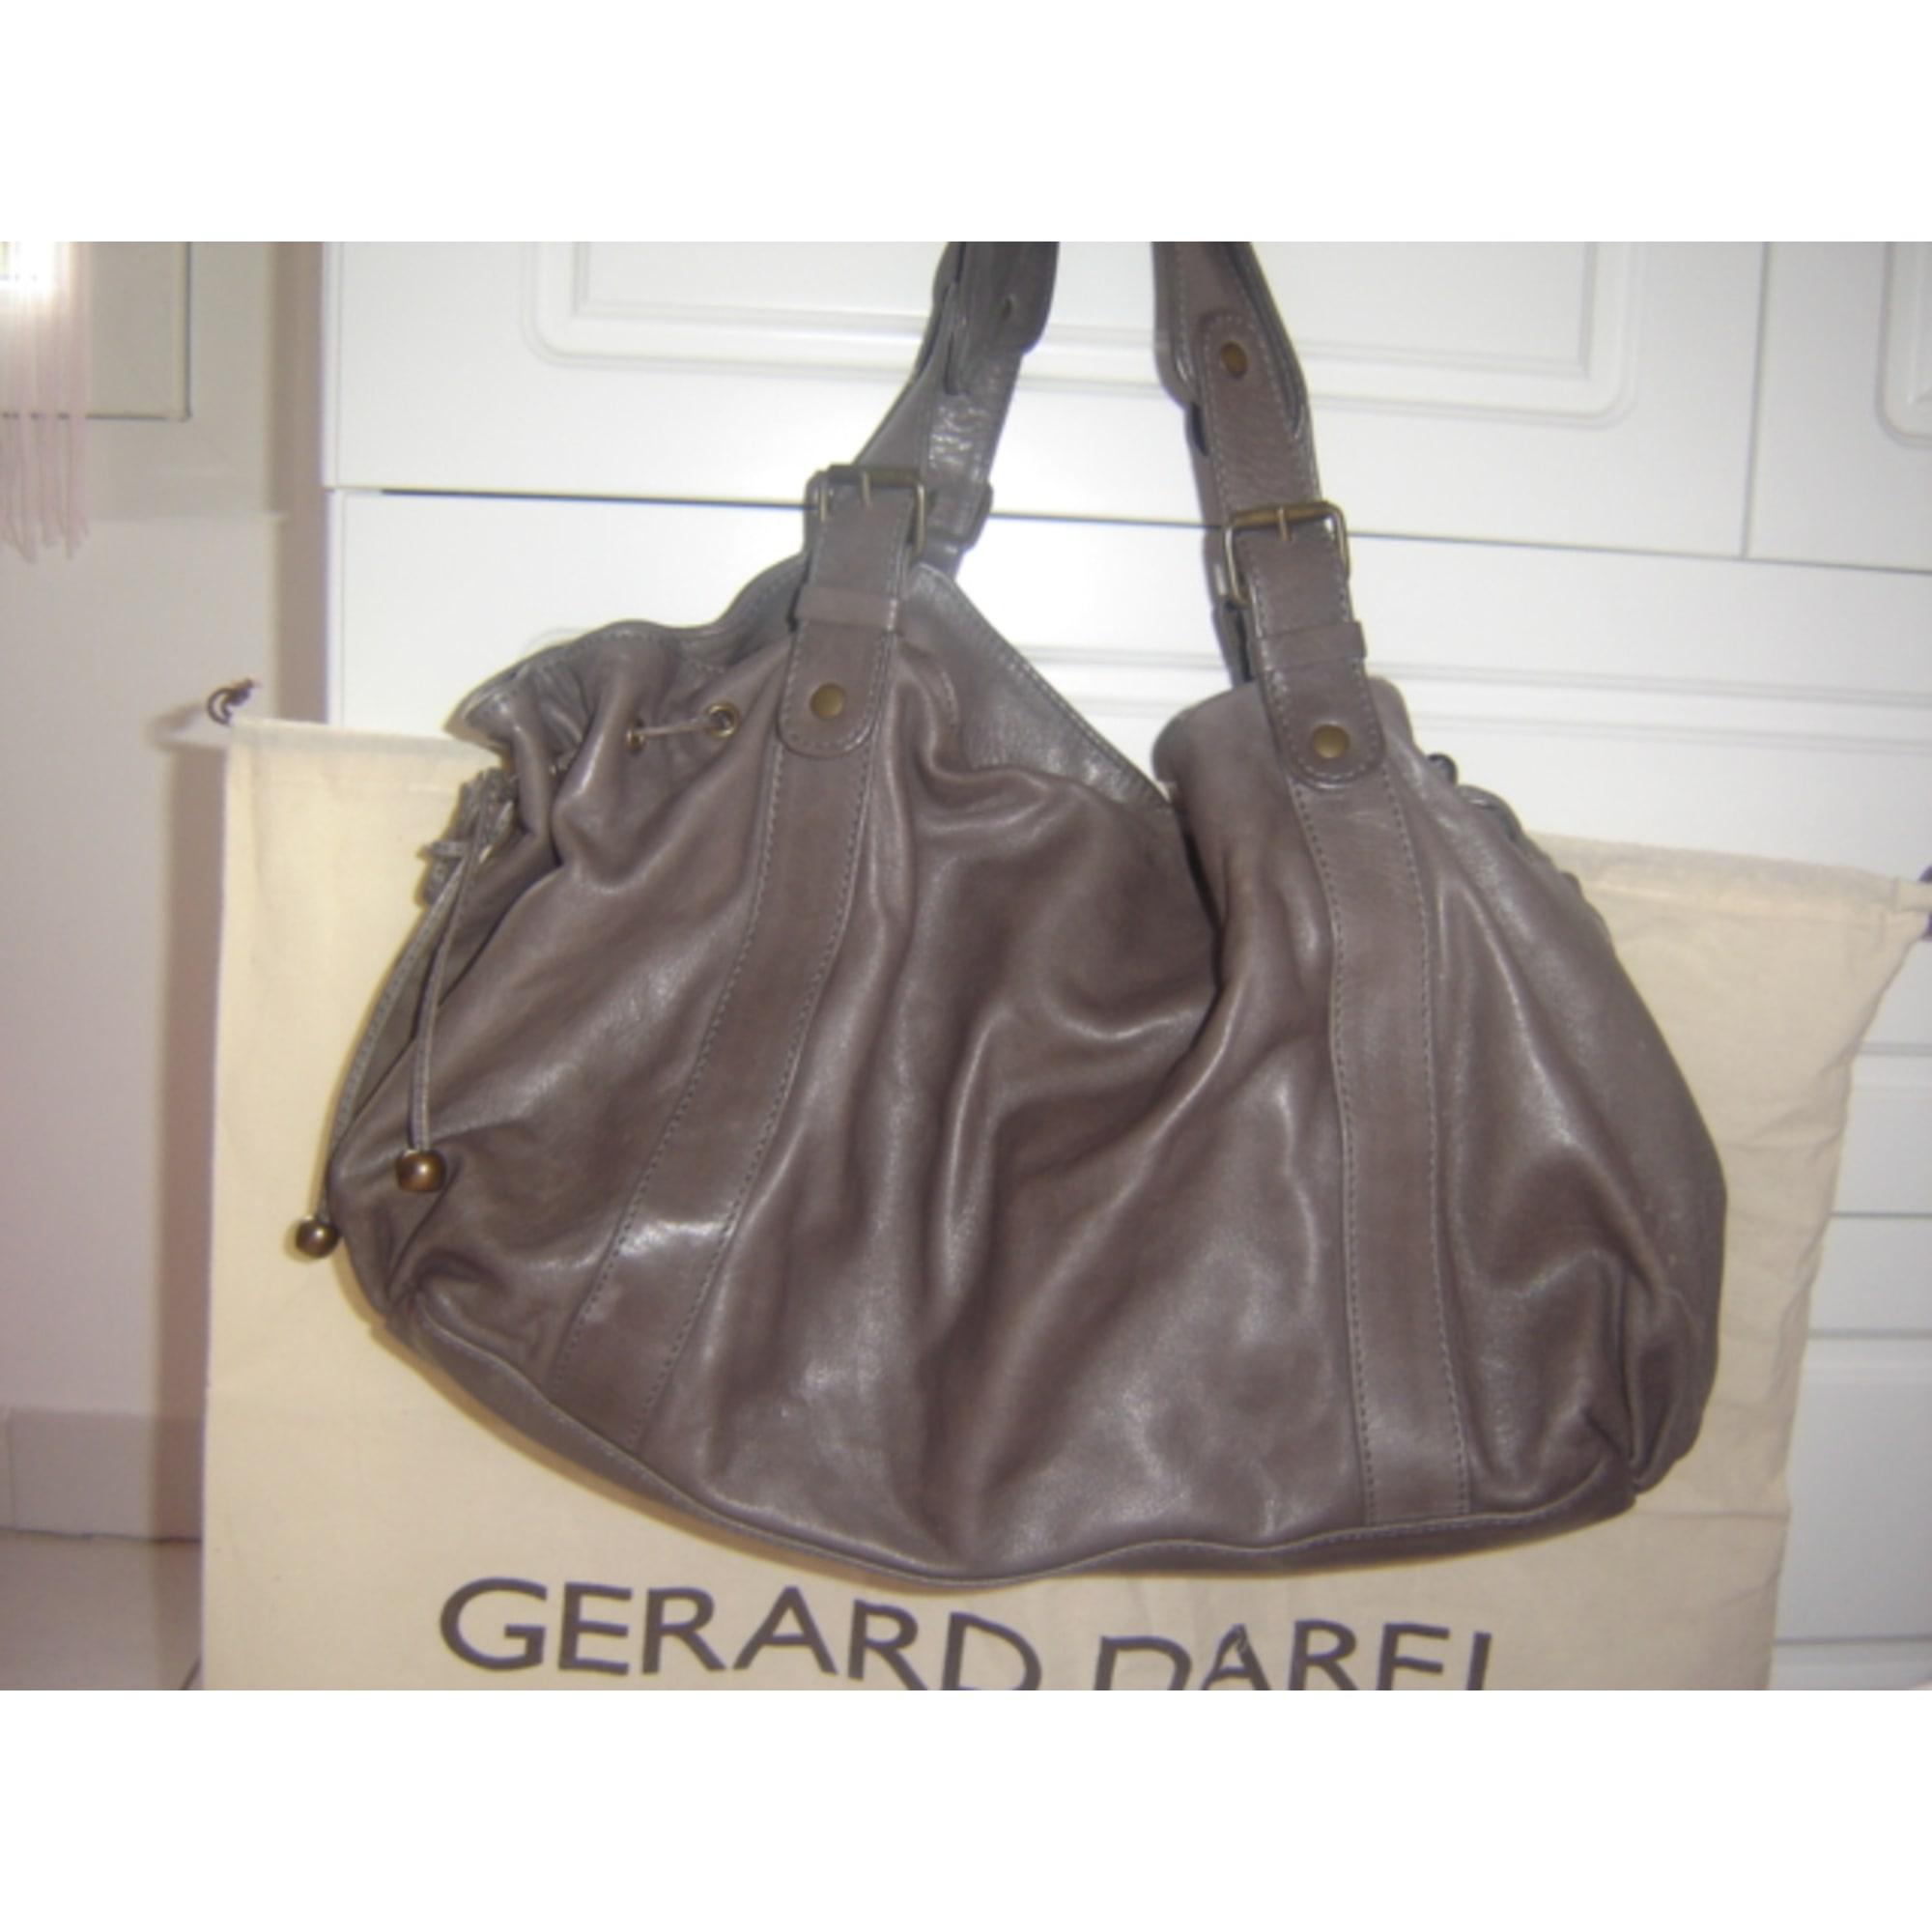 a8ac39574c176 Sac à main en cuir GERARD DAREL gris vendu par Nanie2b54543 - 227240